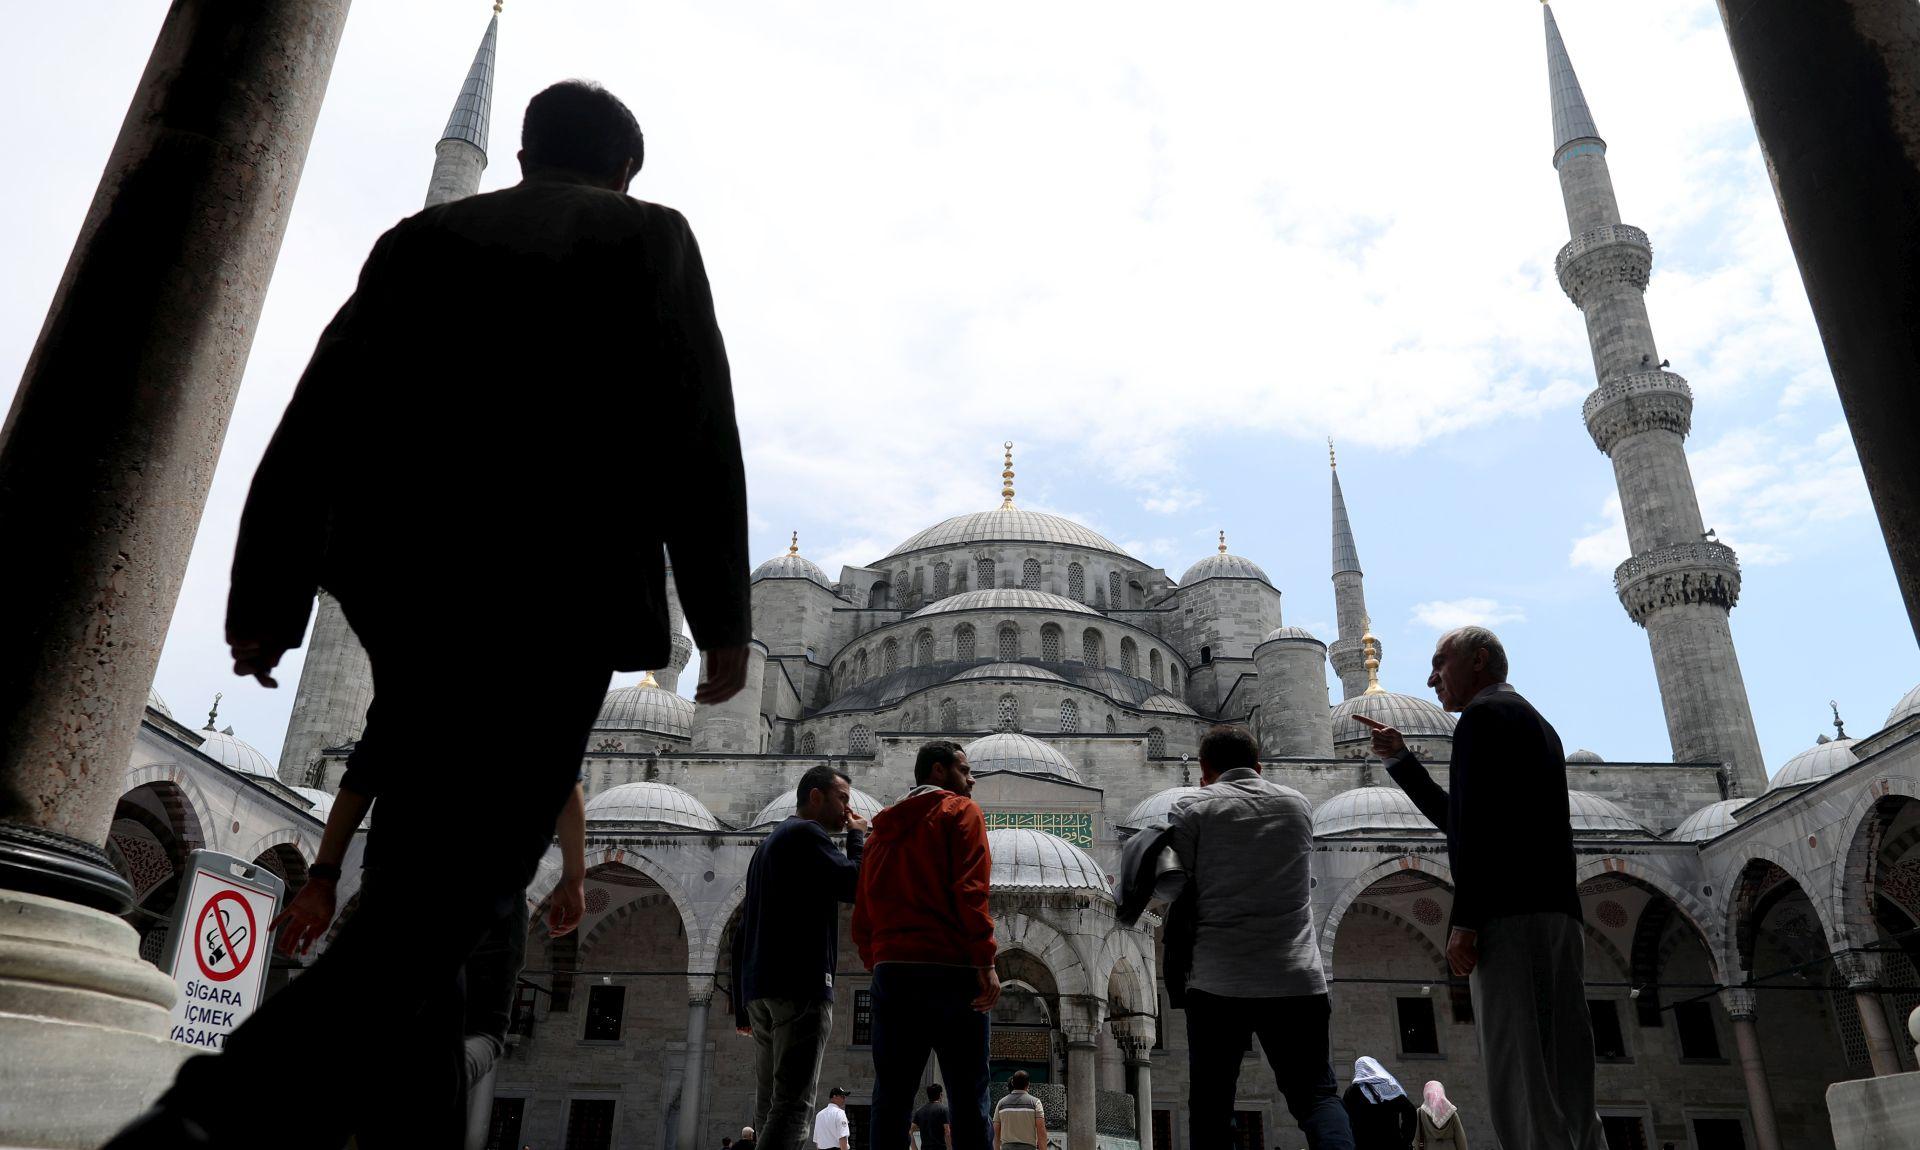 Istanbulski guverner zabranio Gay Pride zbog 'sigurnosti'